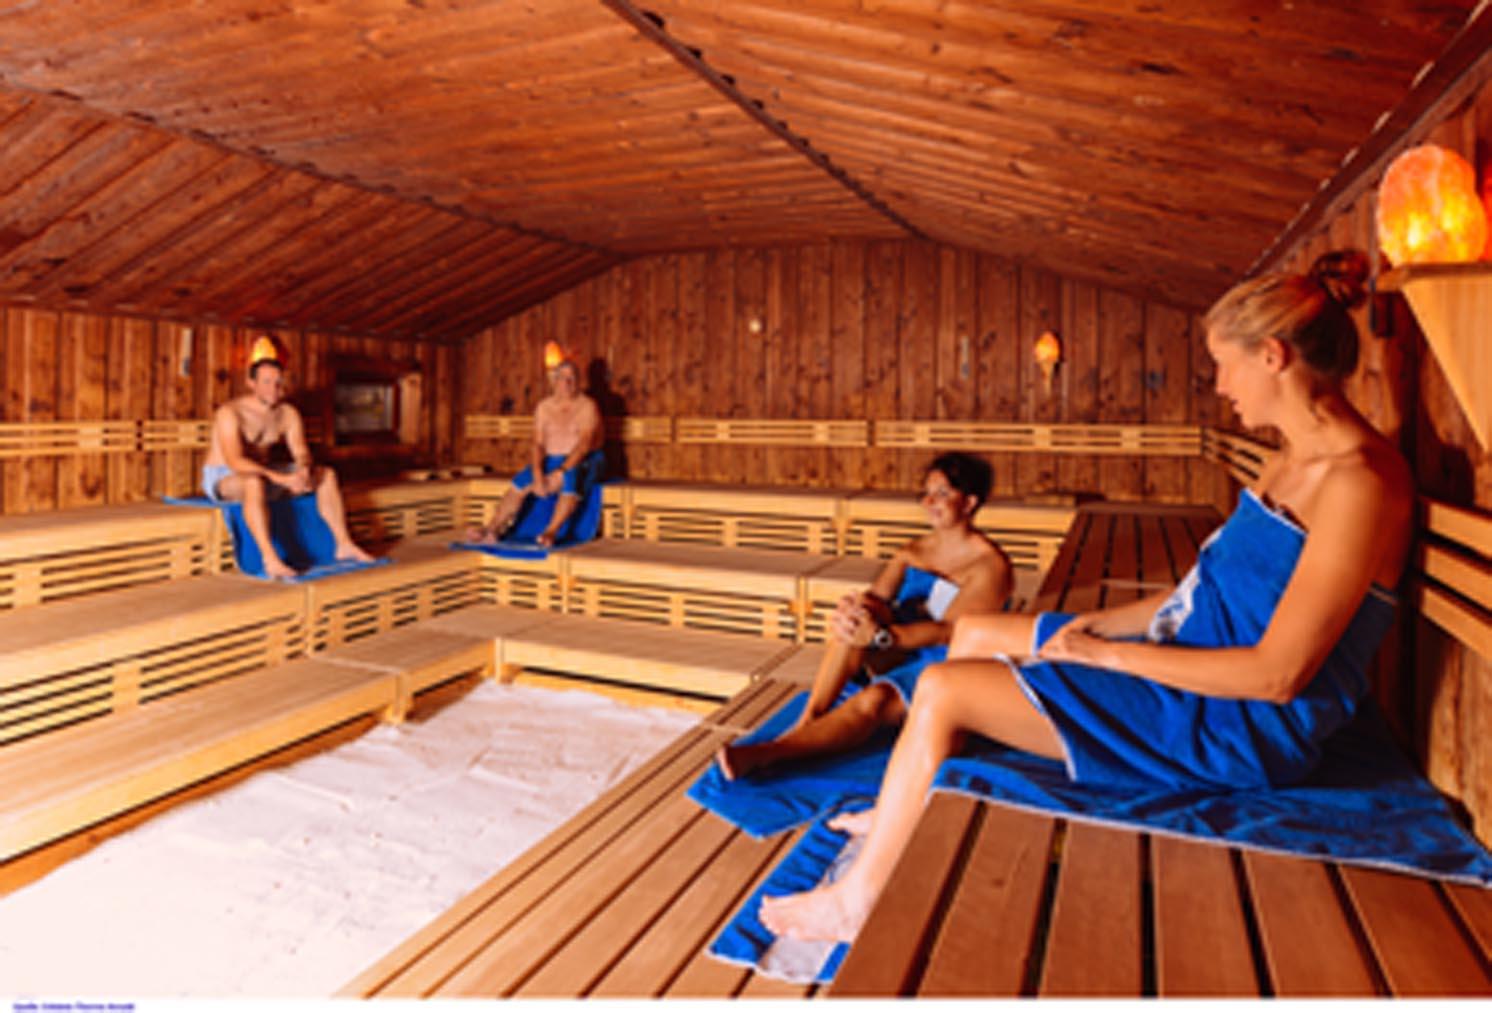 Sauna in Bad Vigaun